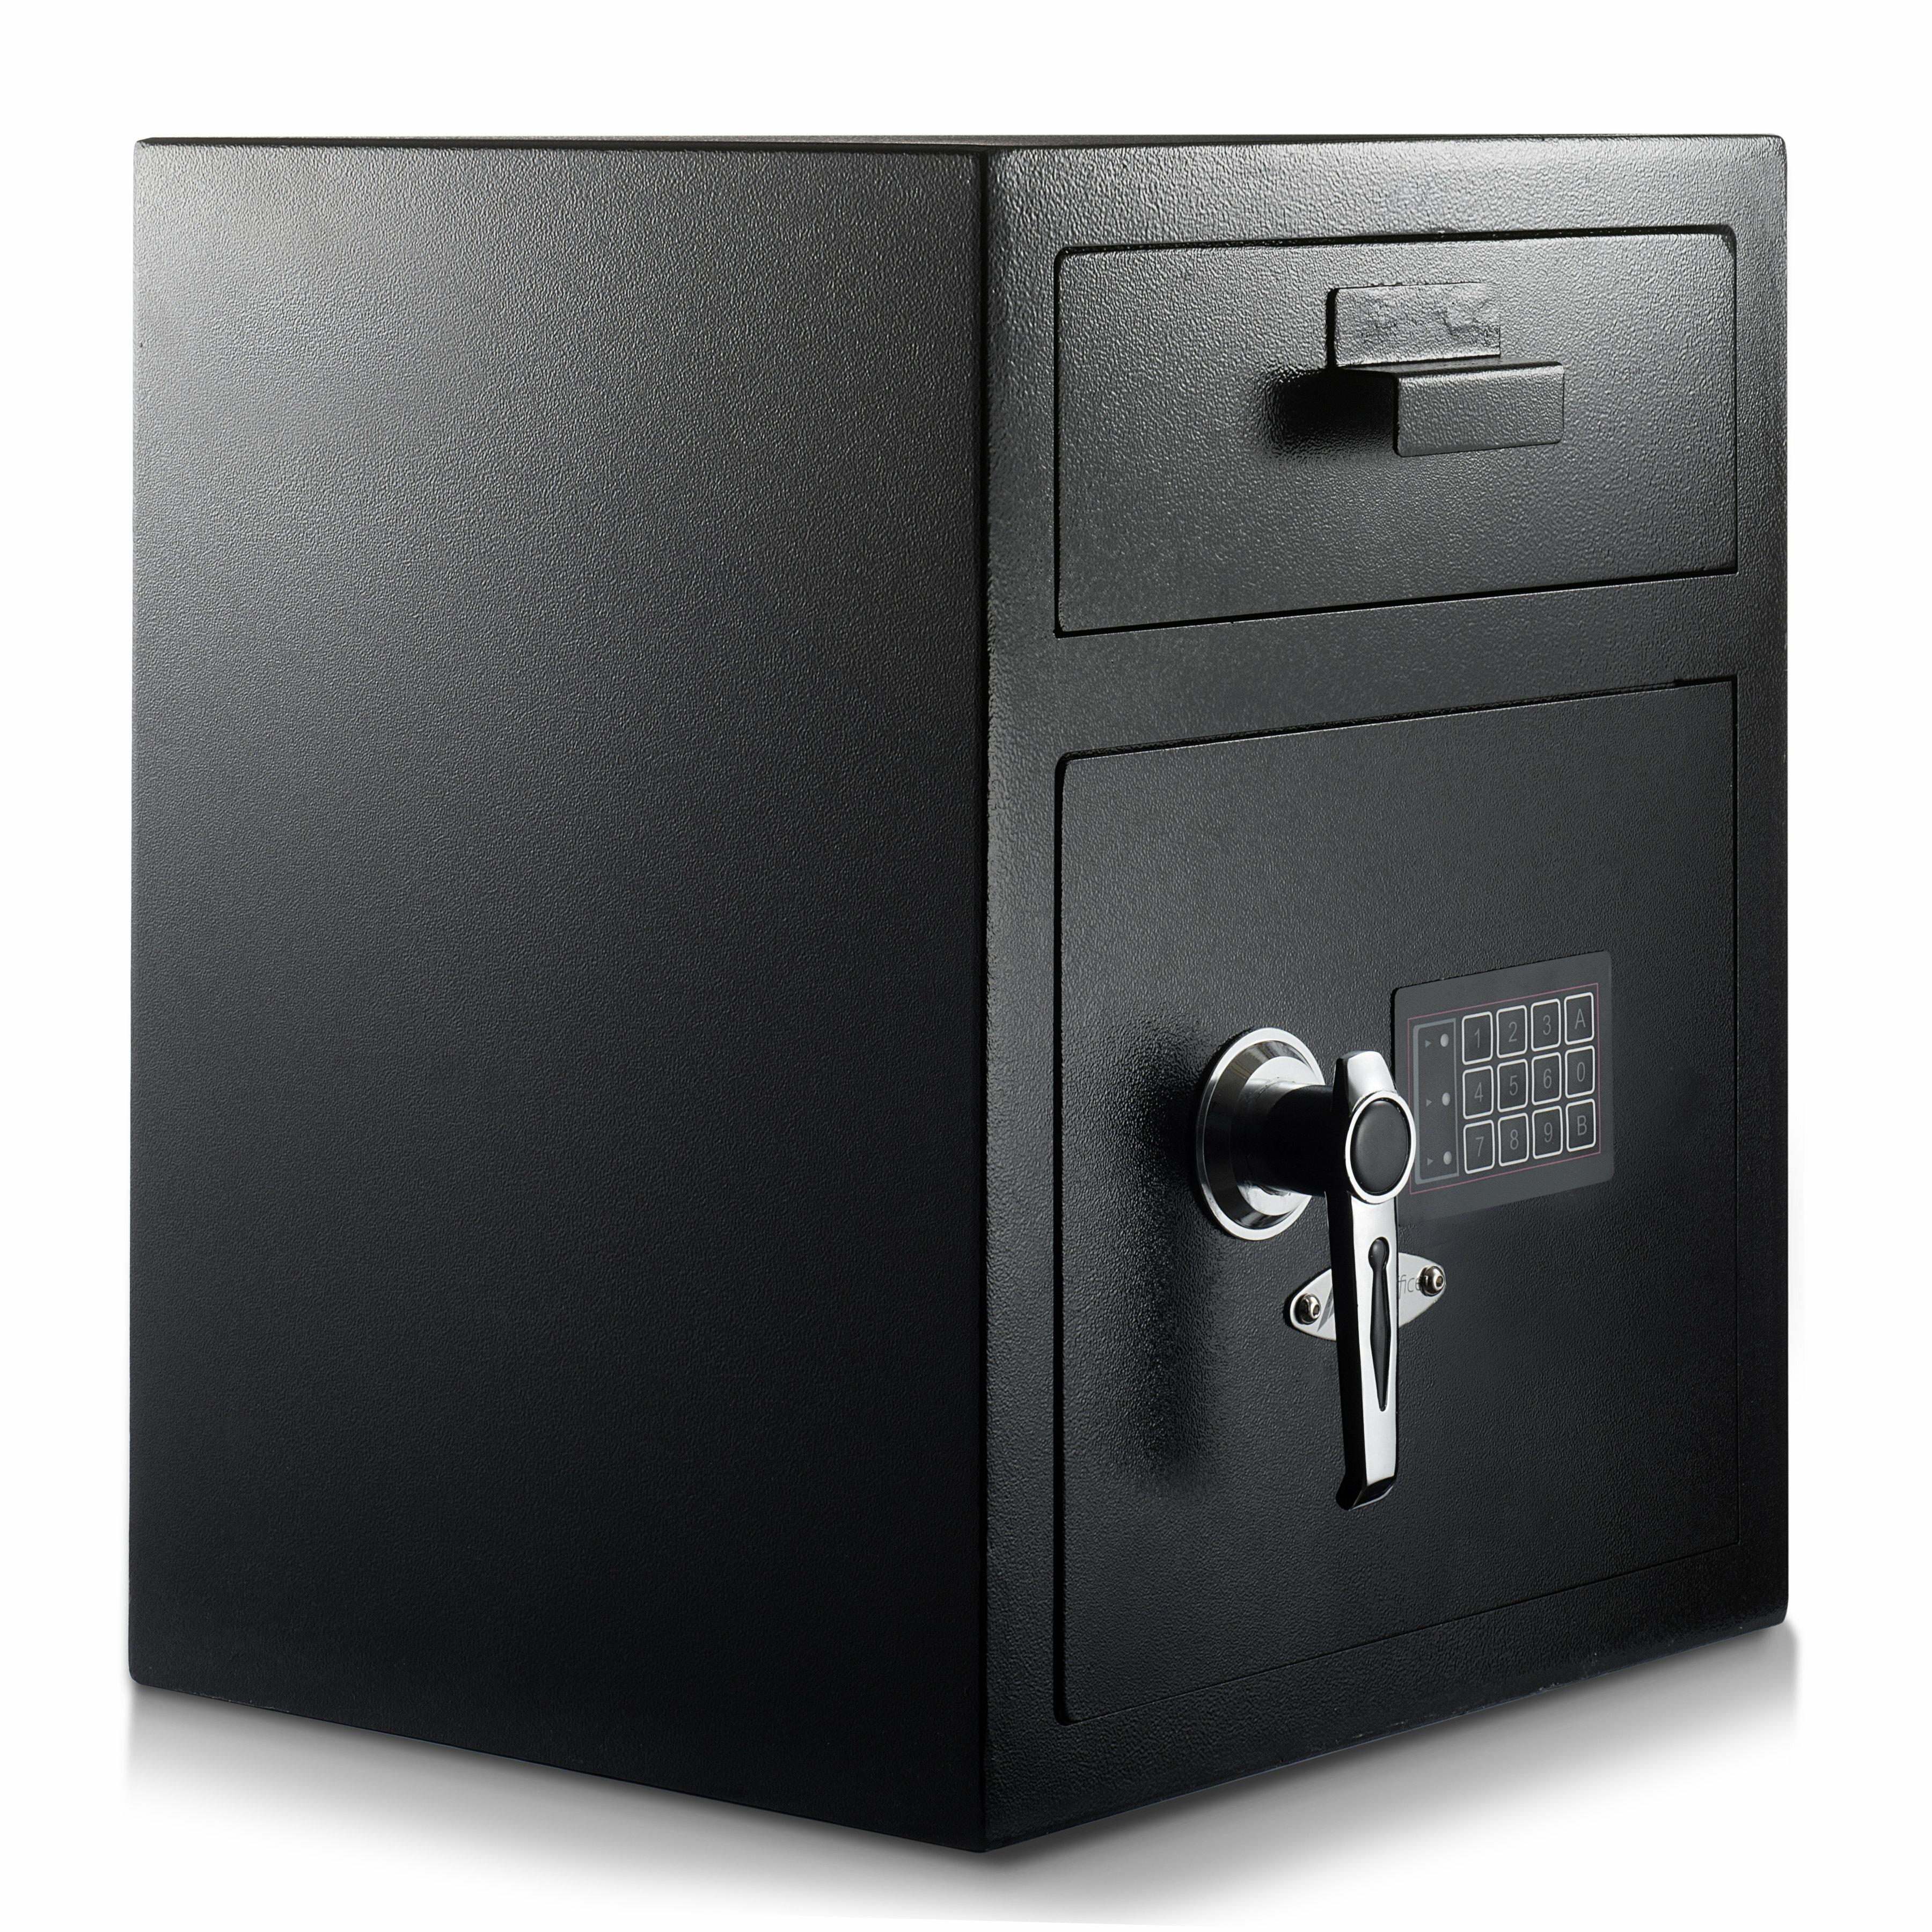 Home & Garden Security Safe Deposit Drop Box Cash Gun Depository ...